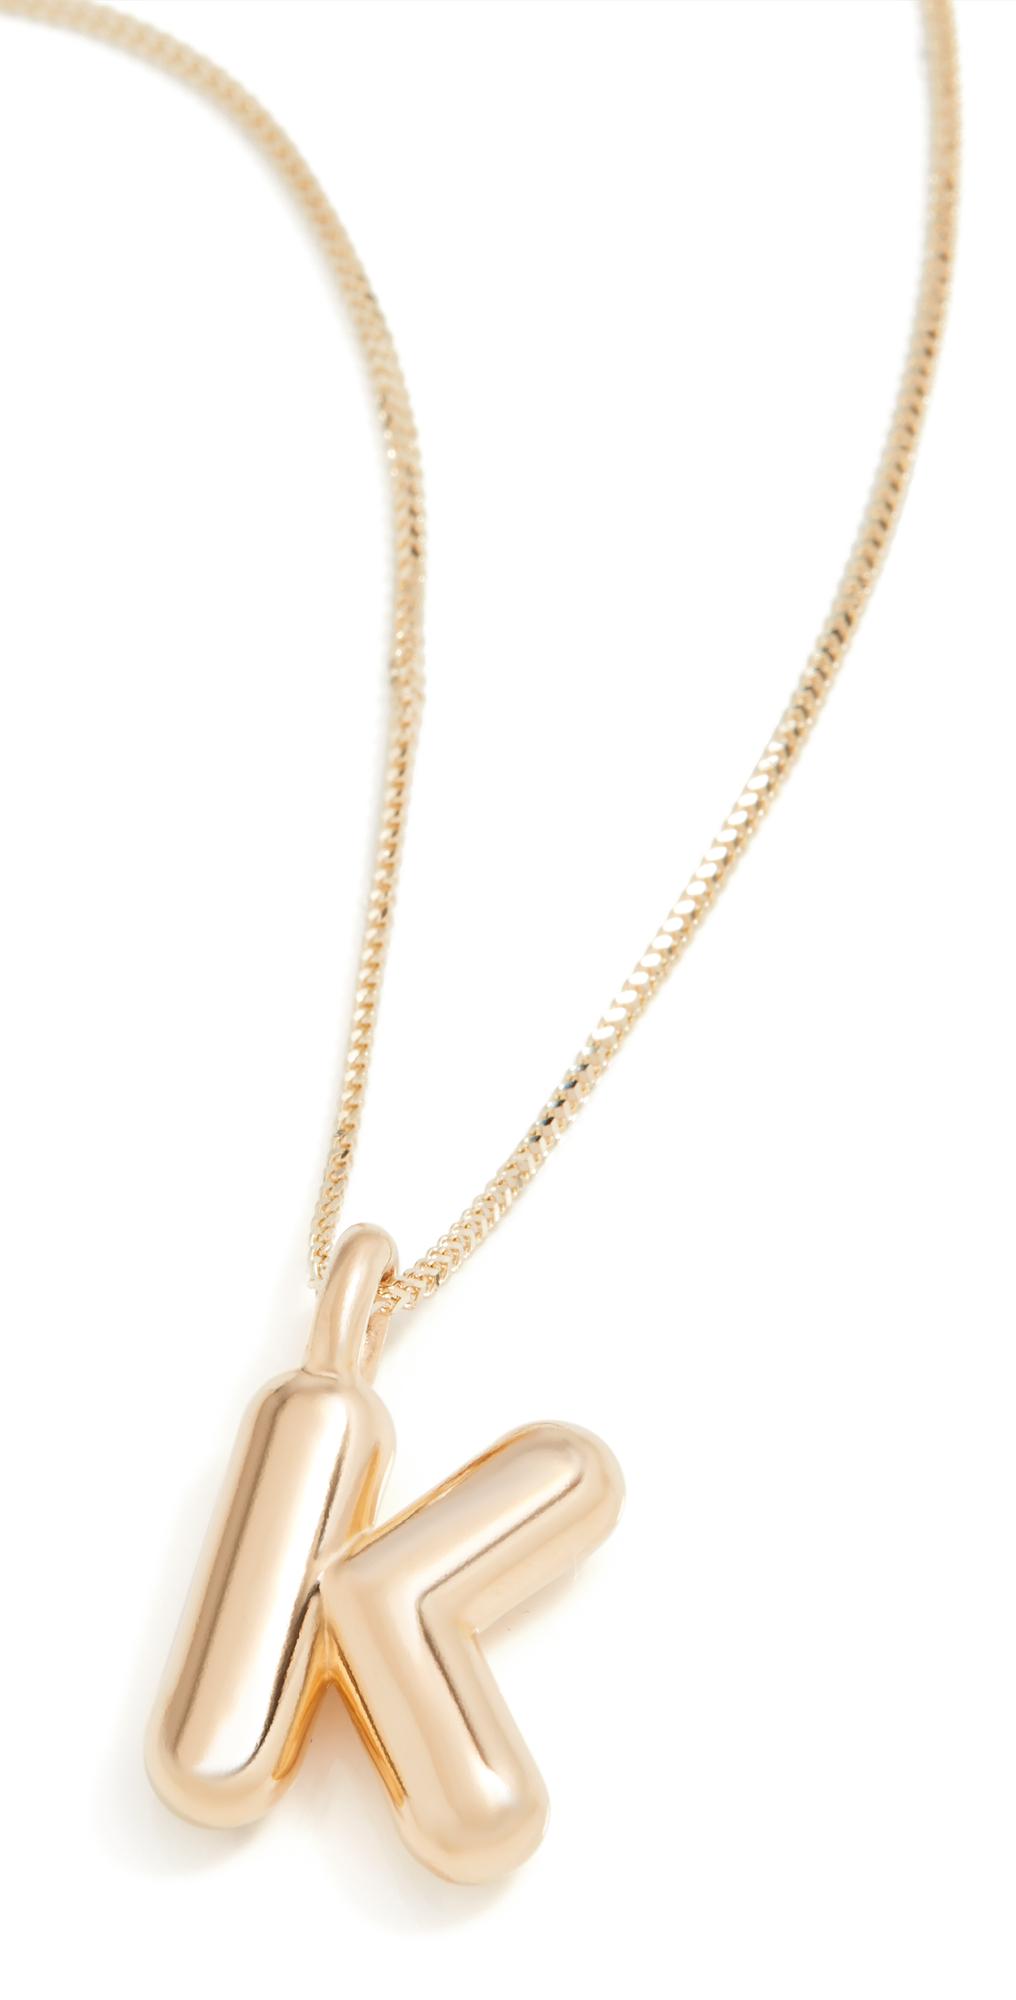 Ariel Gordon Jewelry Helium Initial Pendant